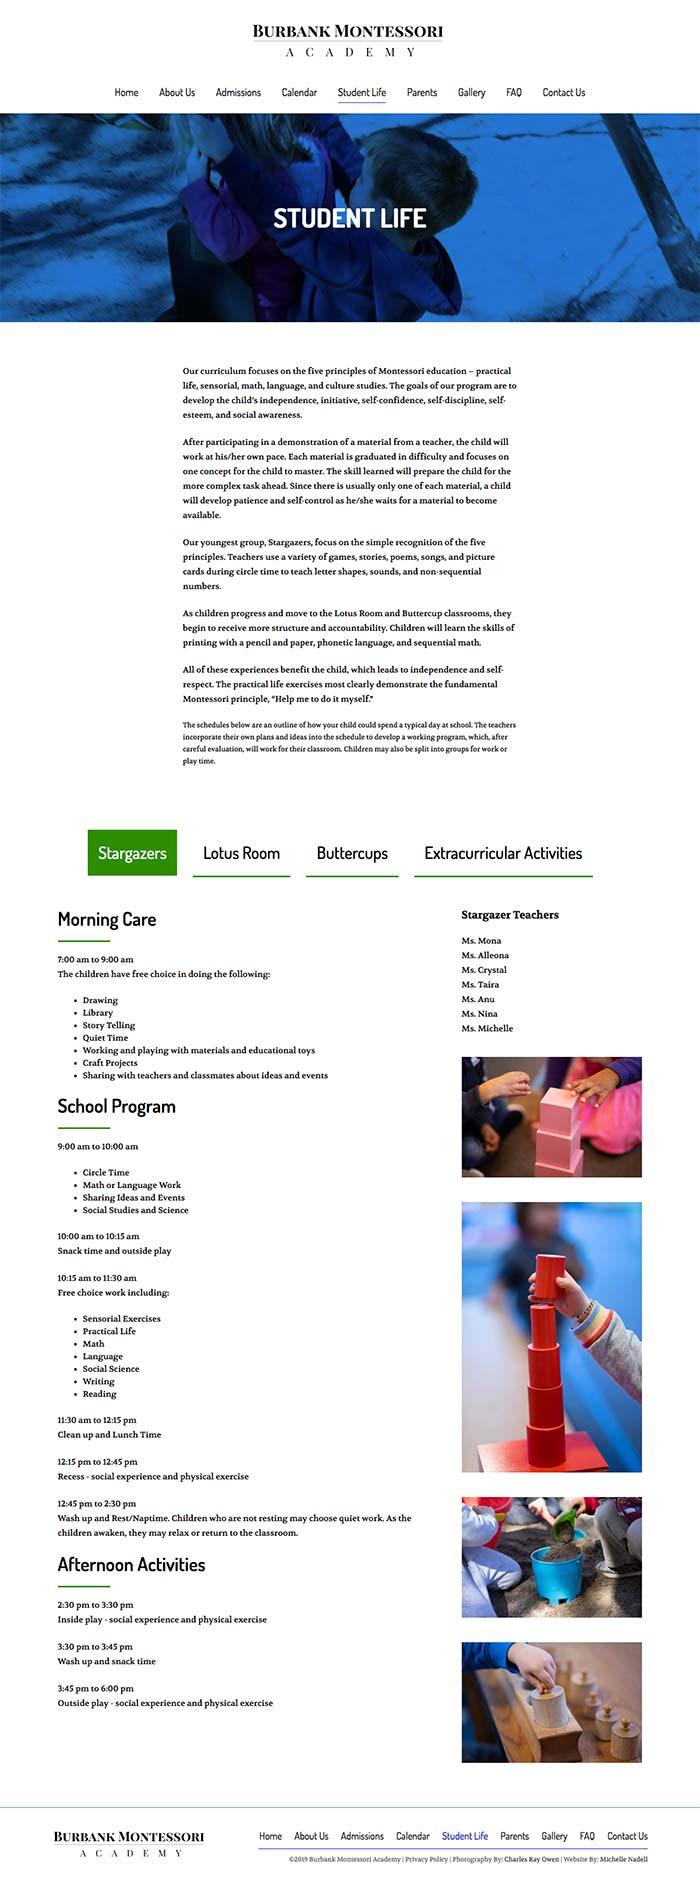 Burbank Montessori Academy student life page screen shot